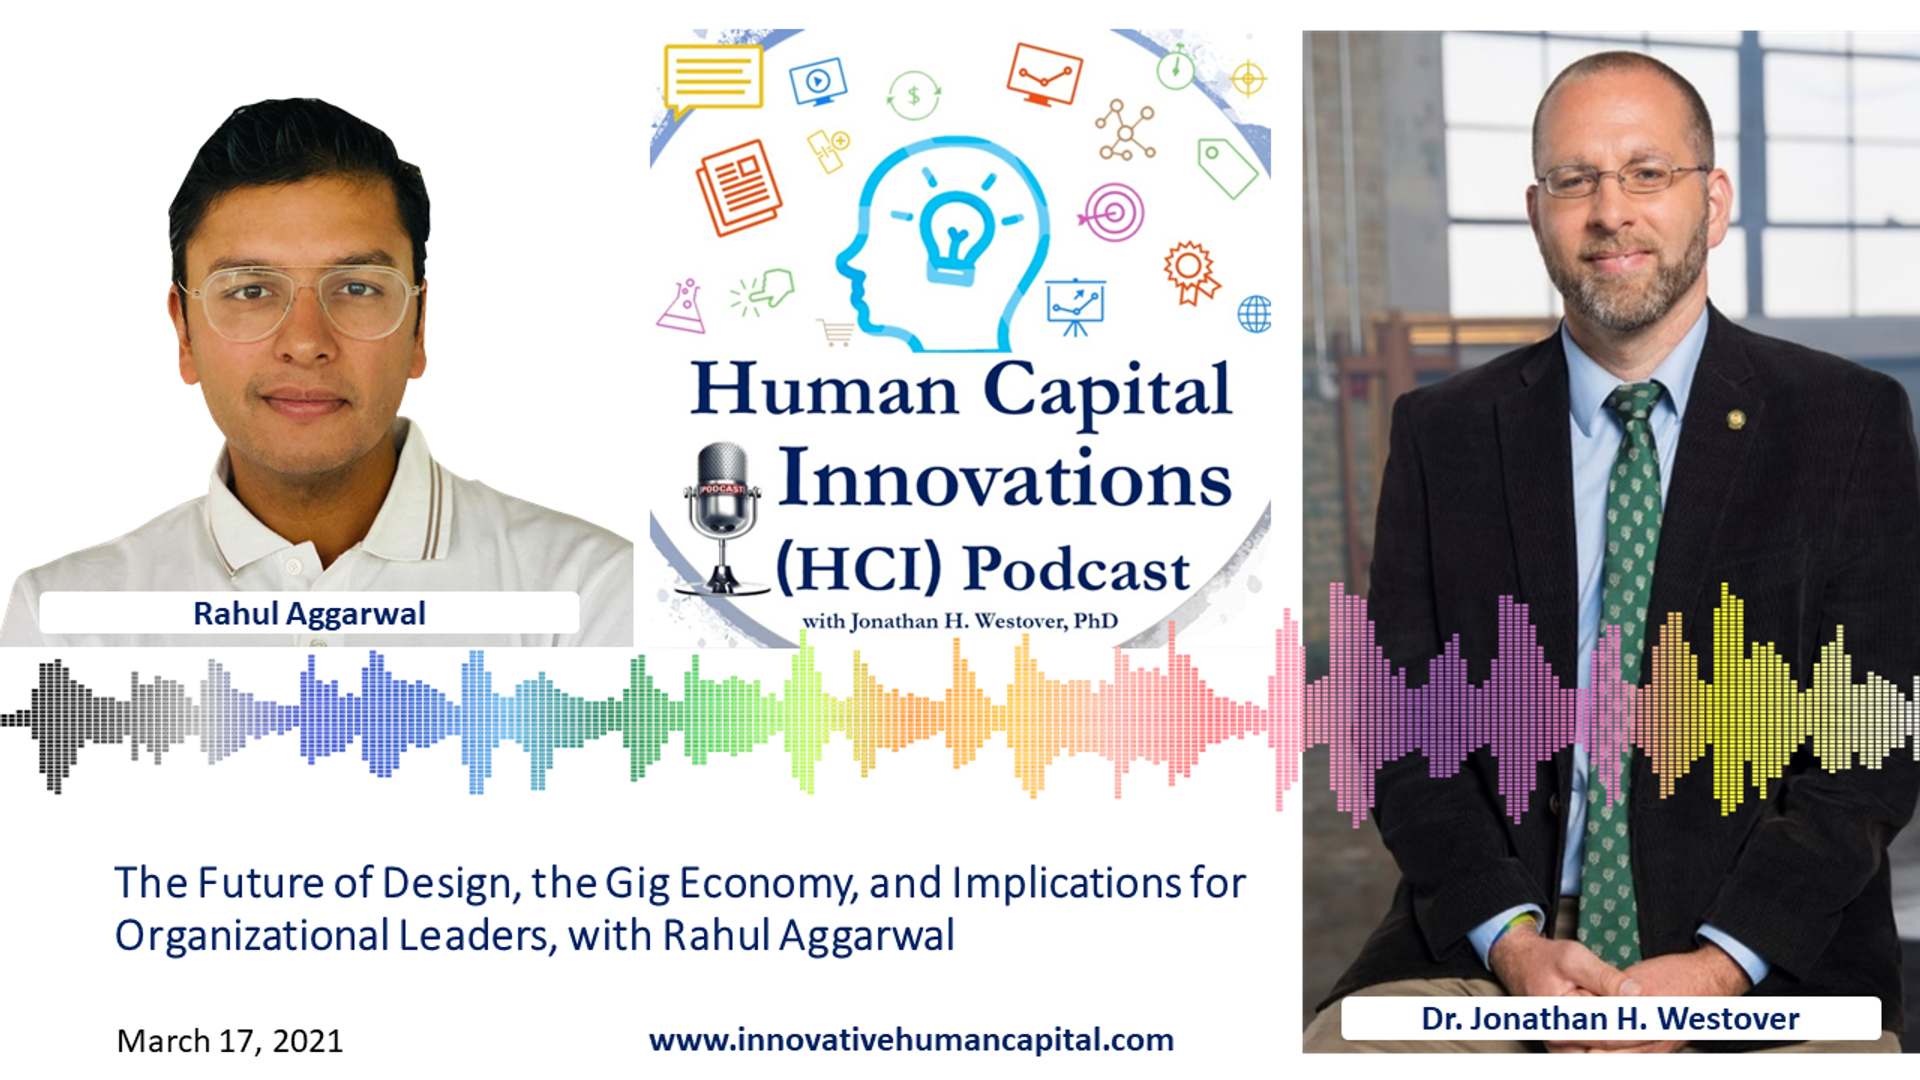 The Future of Design, the Gig Economy, & Organizational Implications